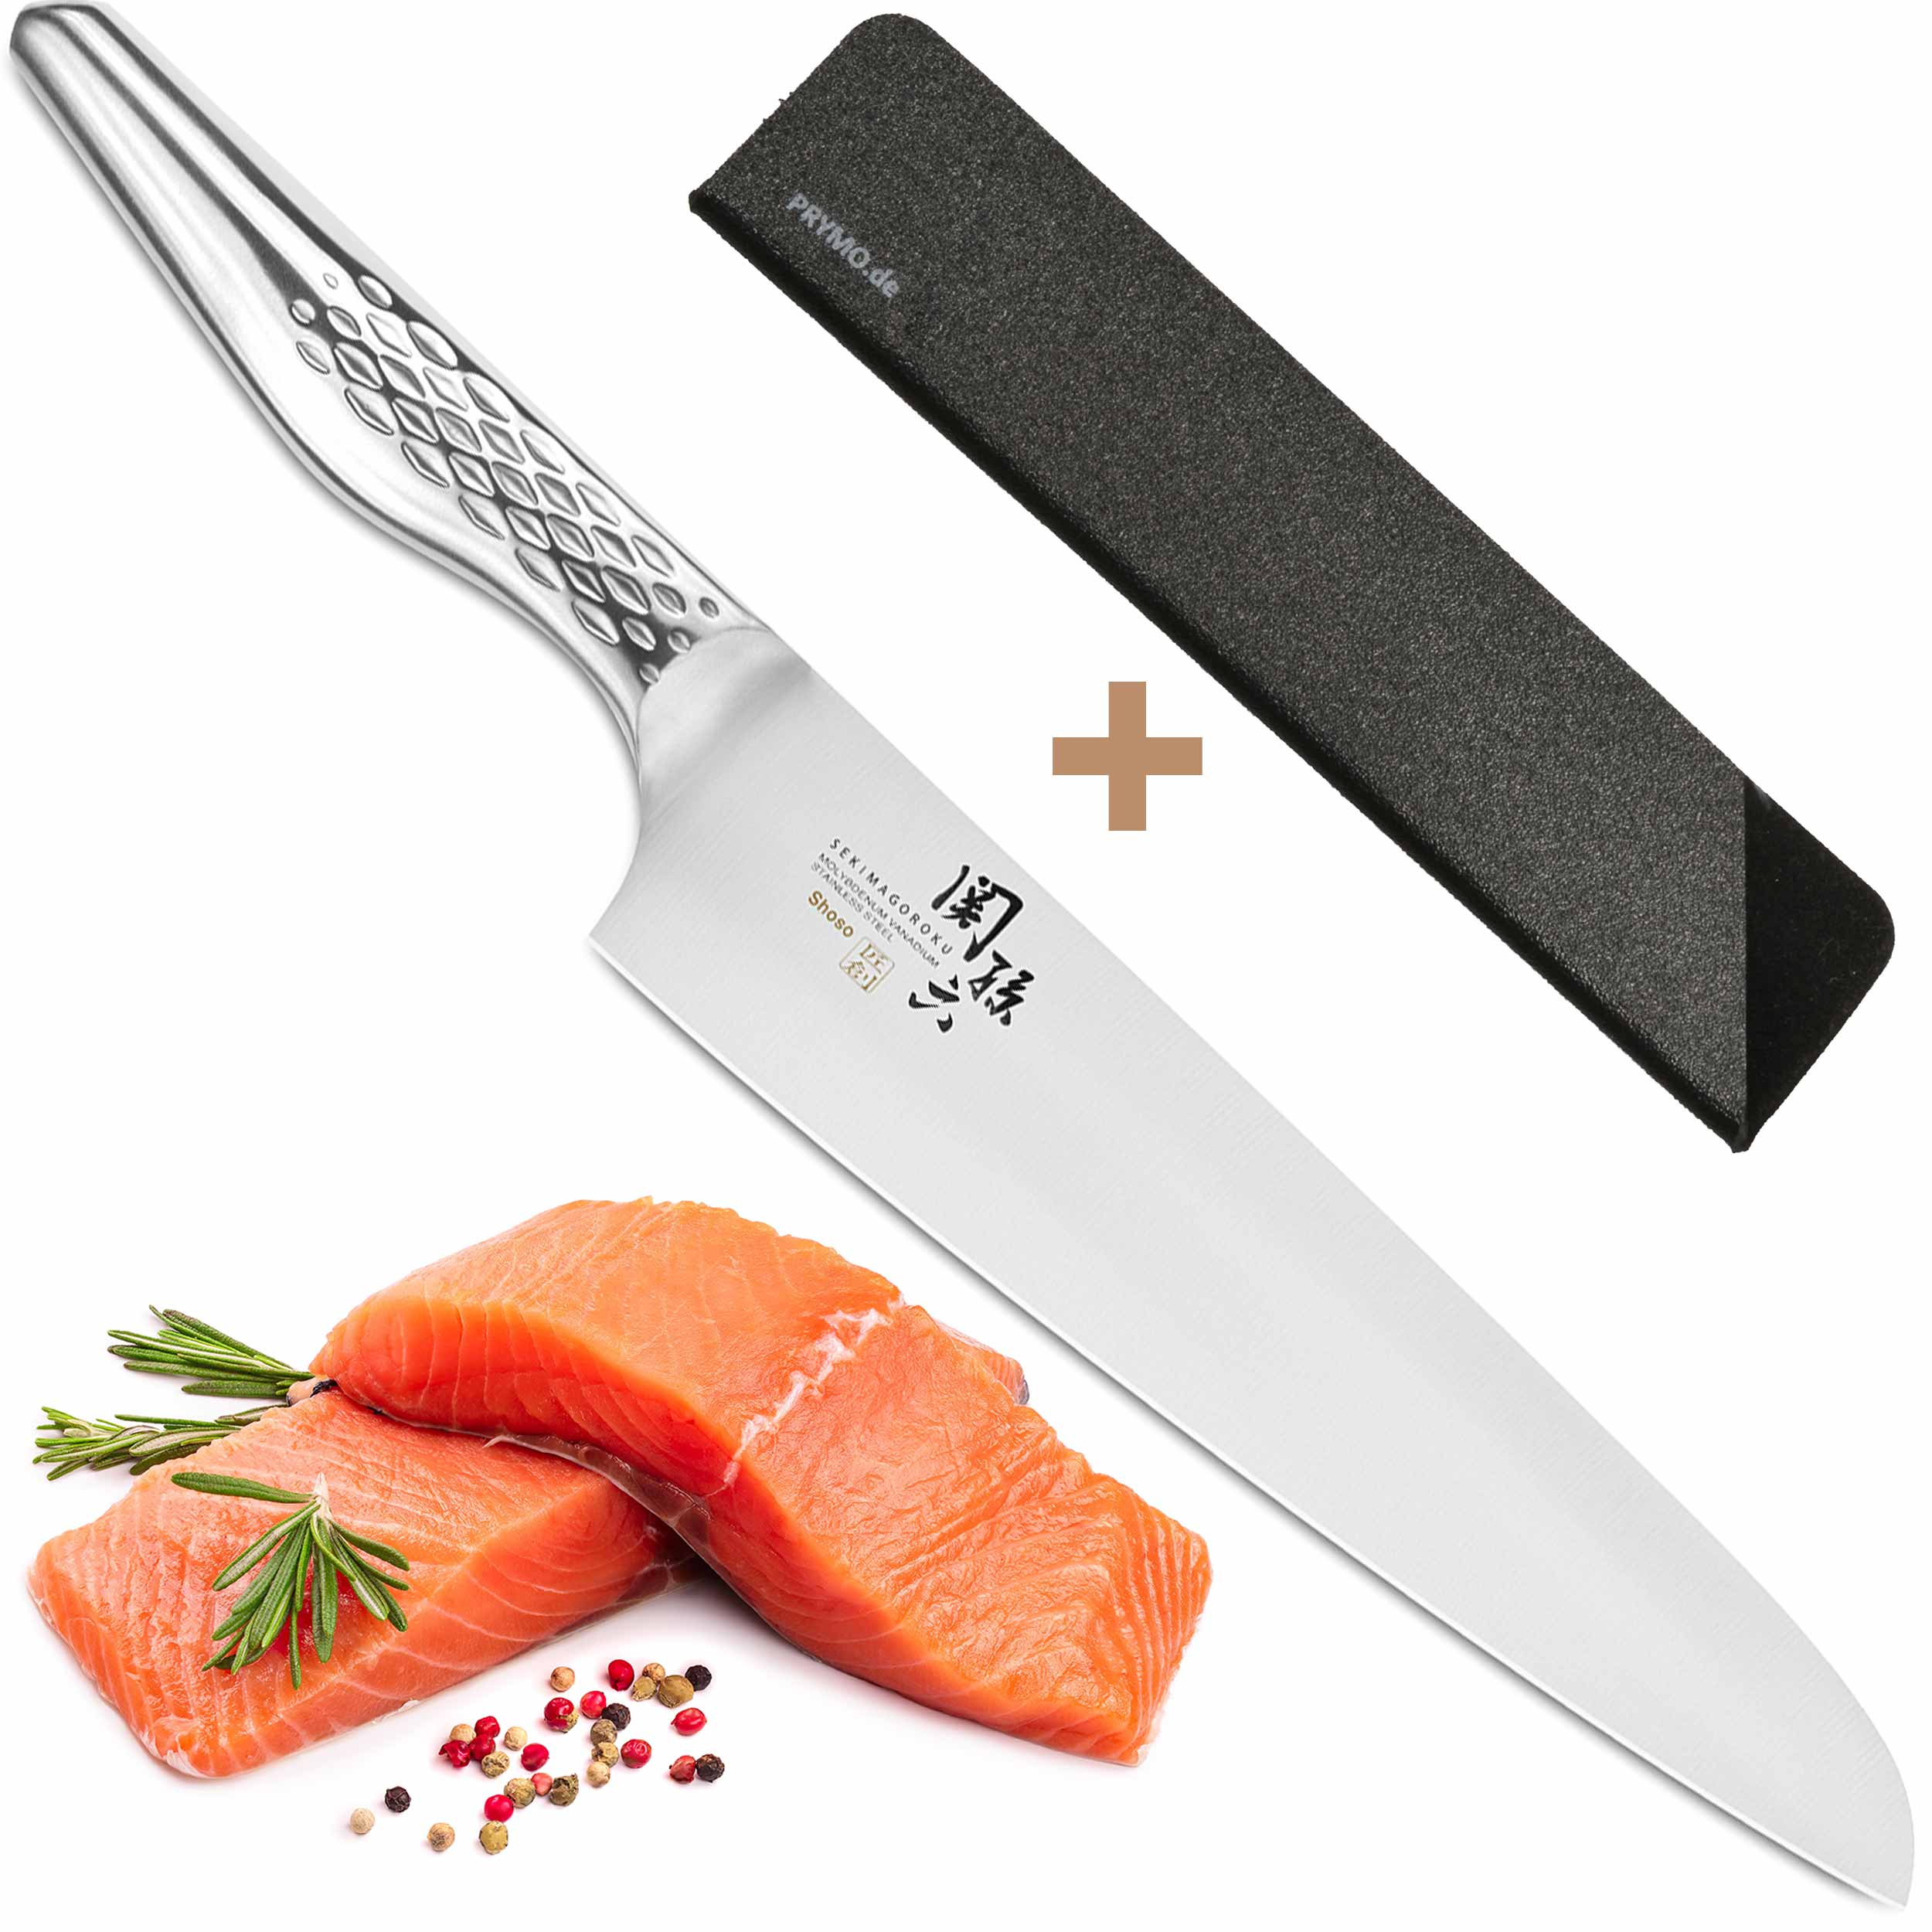 KAI Seki Magoroku Shoso AB-5159 Kochmesser 21 cm